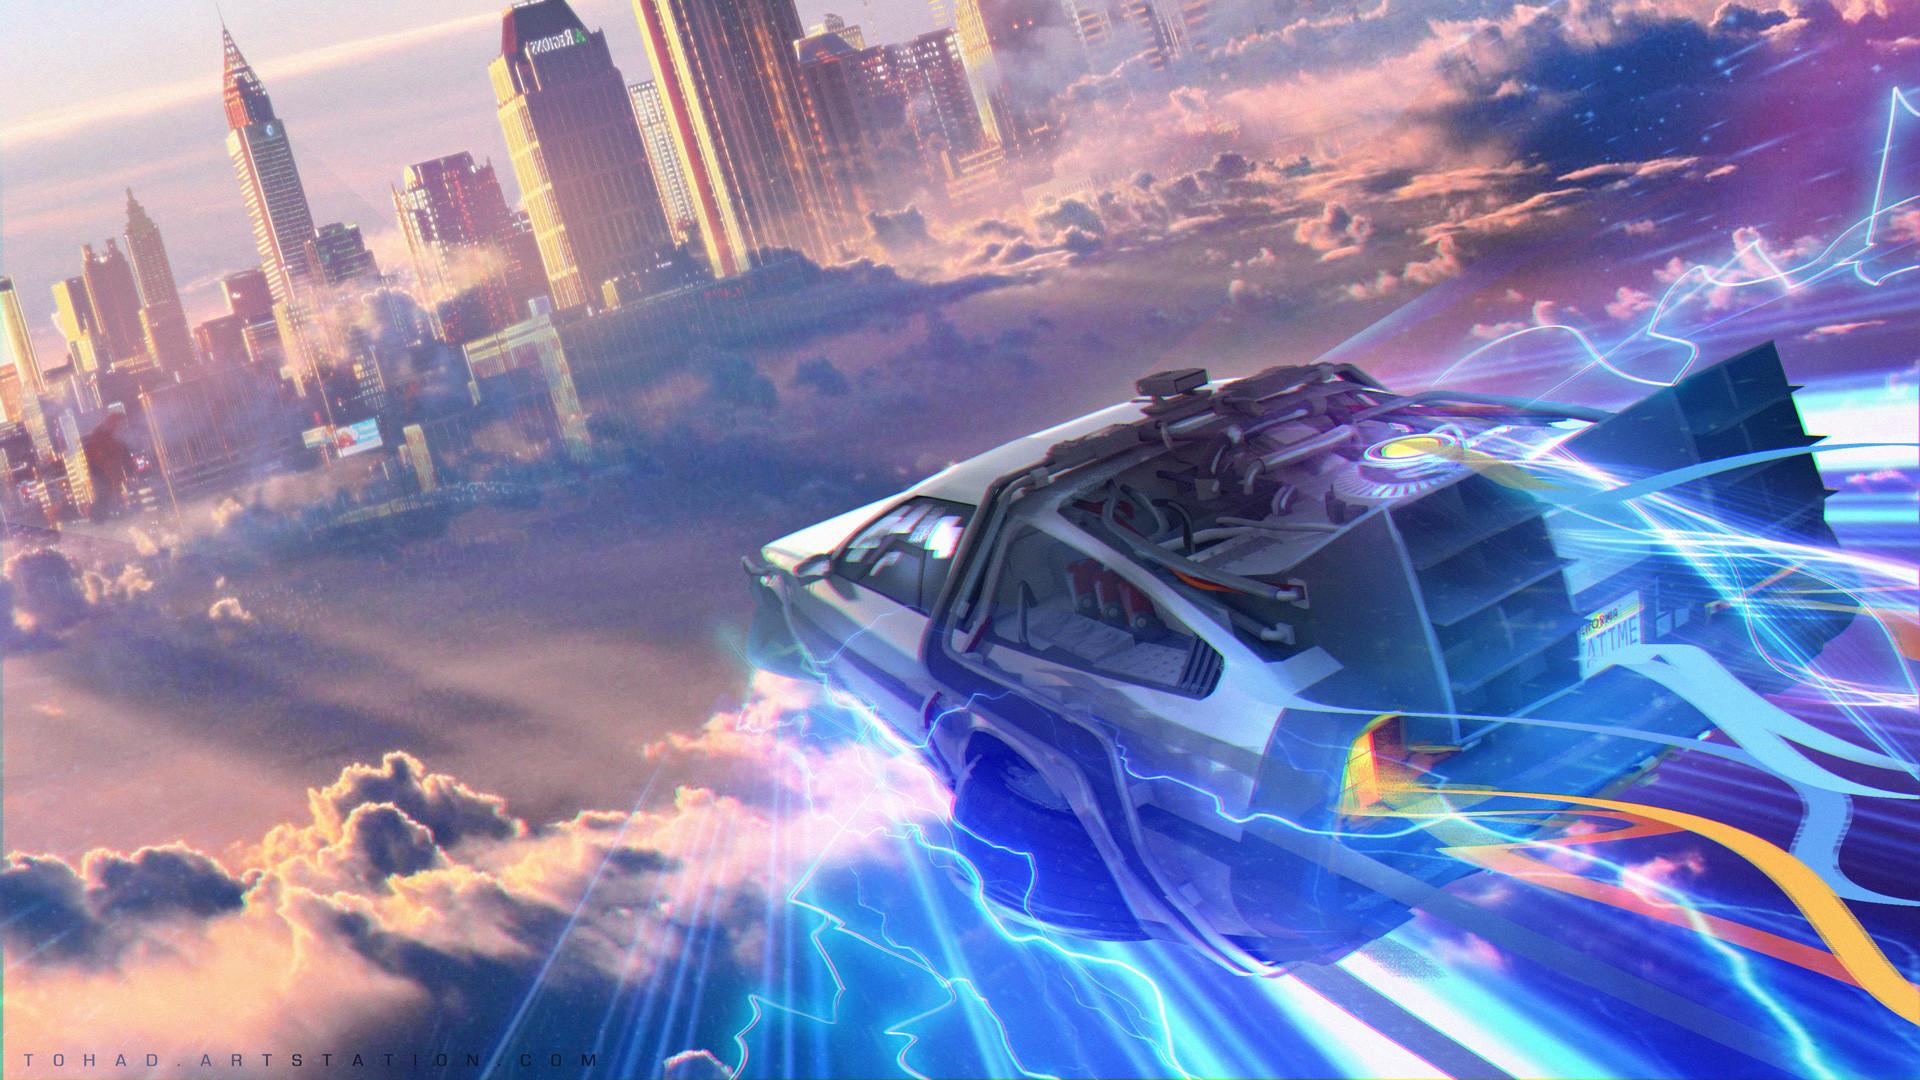 The Time Machine Back To Future DMC DeLorean Flying Artwork Cityscape Science Fiction